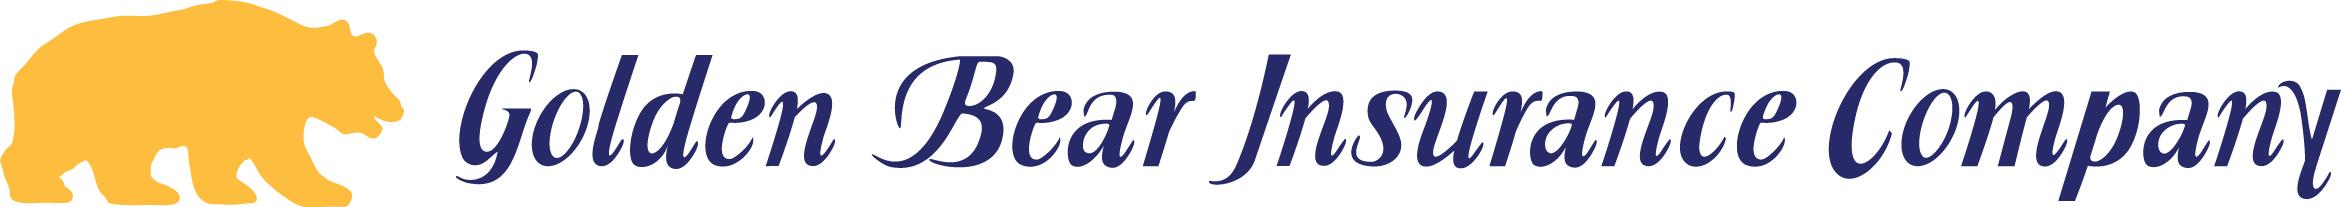 GBIC_Logo_Horizontal